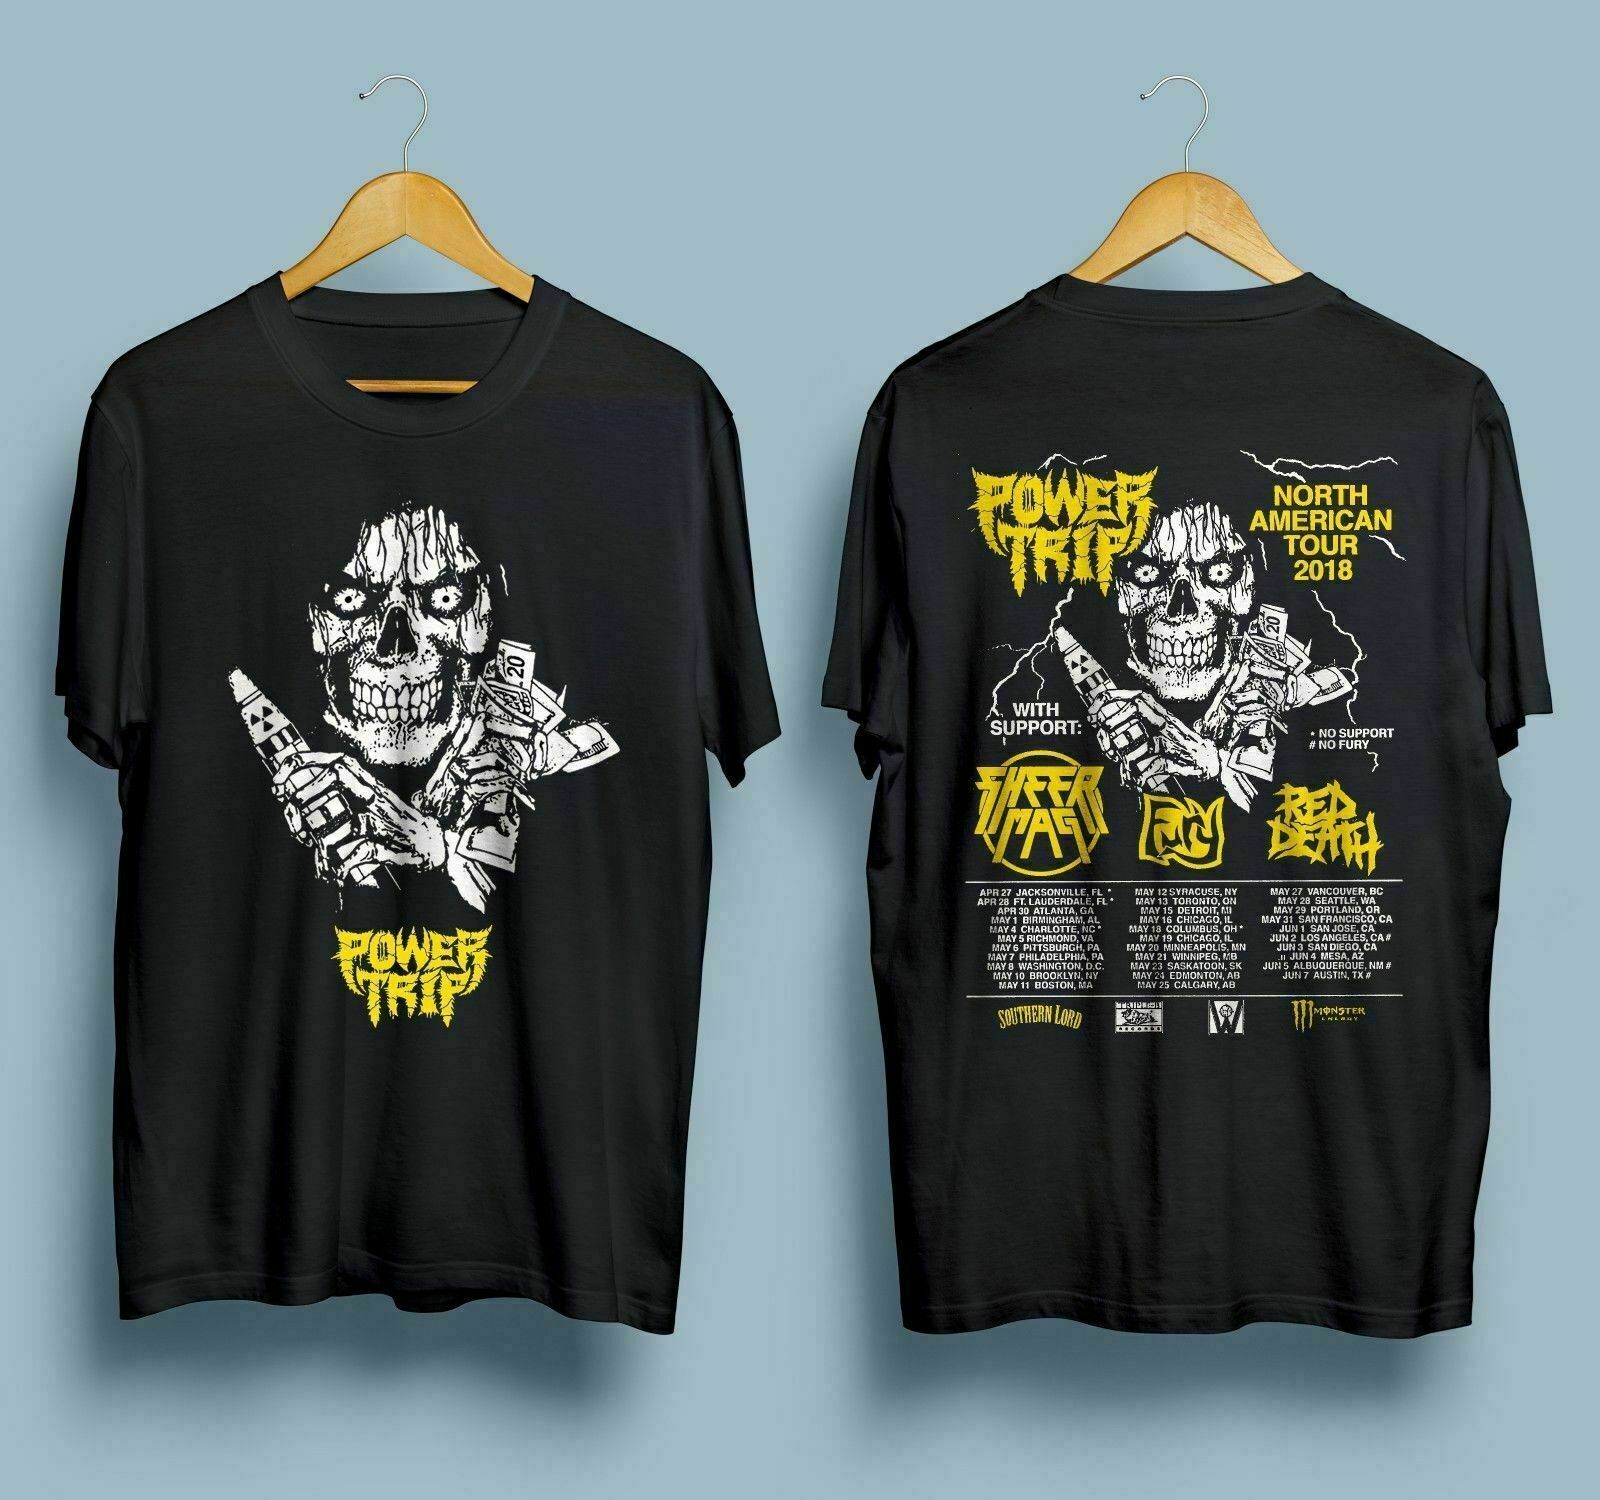 Raro viaje de energía North American Tour 2018 camiseta Tamaño Xl otro tamaño Chat Me